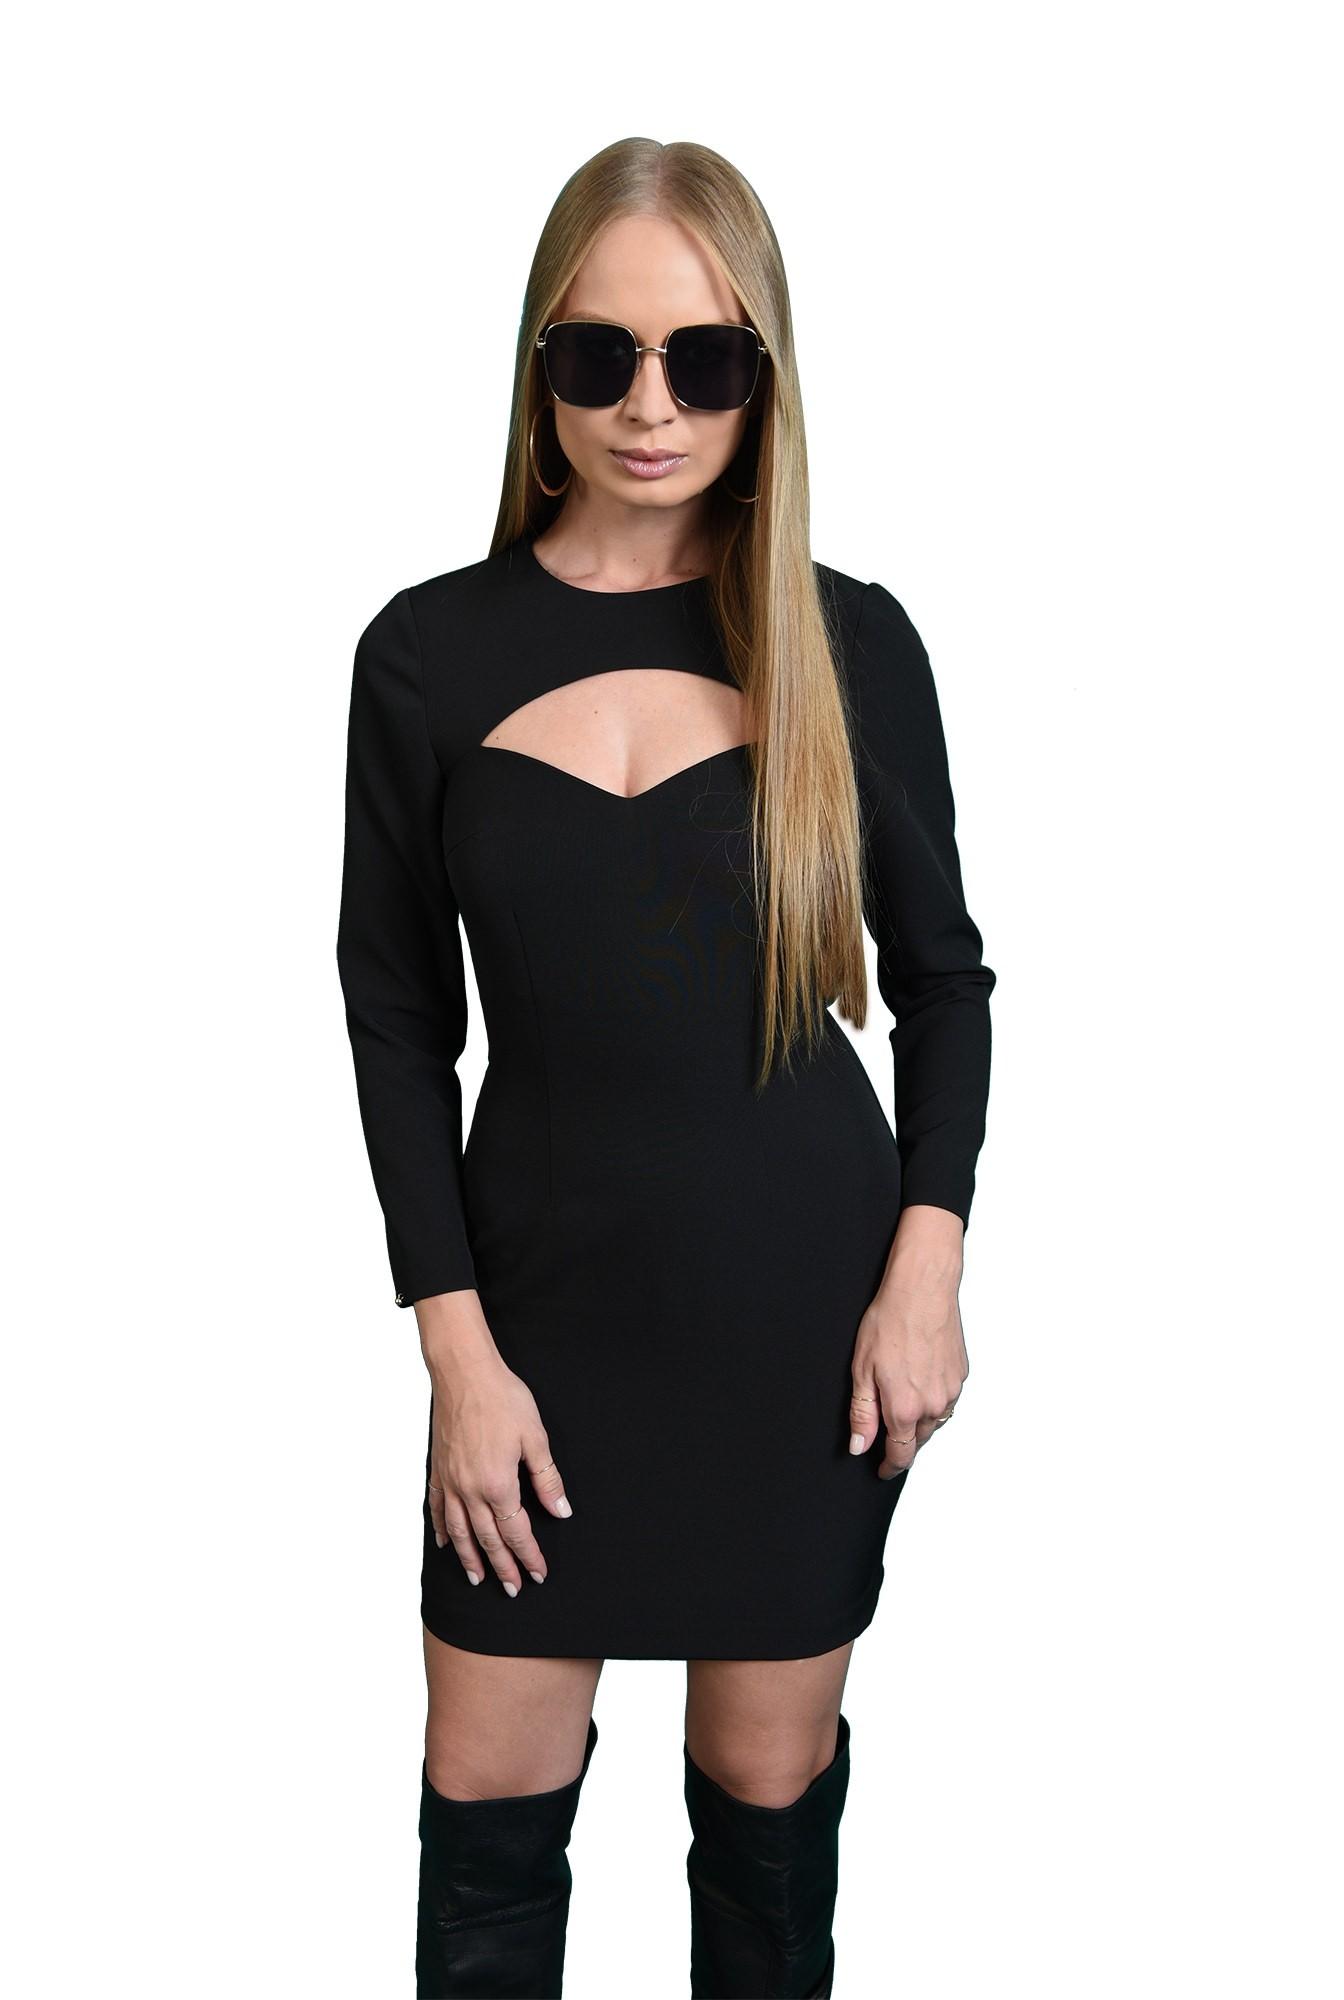 3 - rochie mini, neagra, cu decupaj, Poema